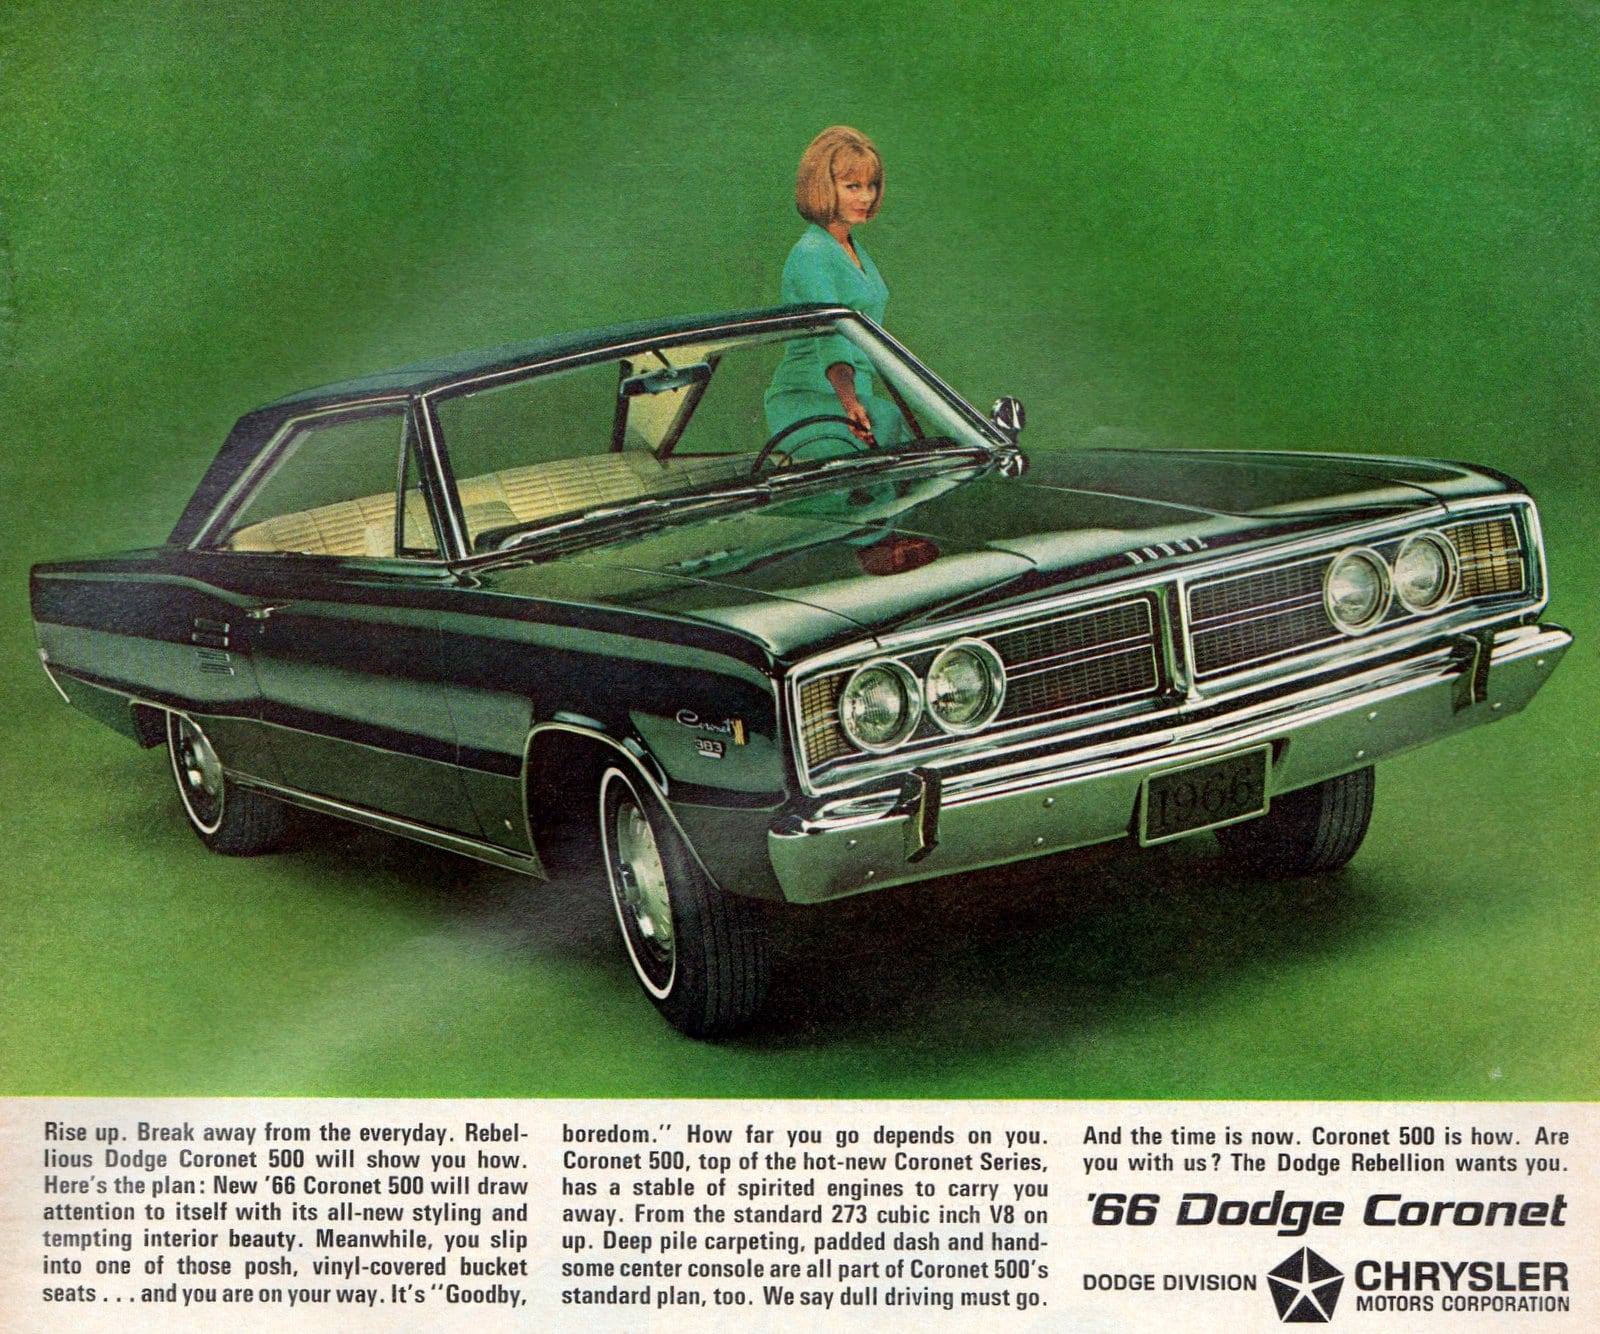 The '66 Dodge Coronet classic car